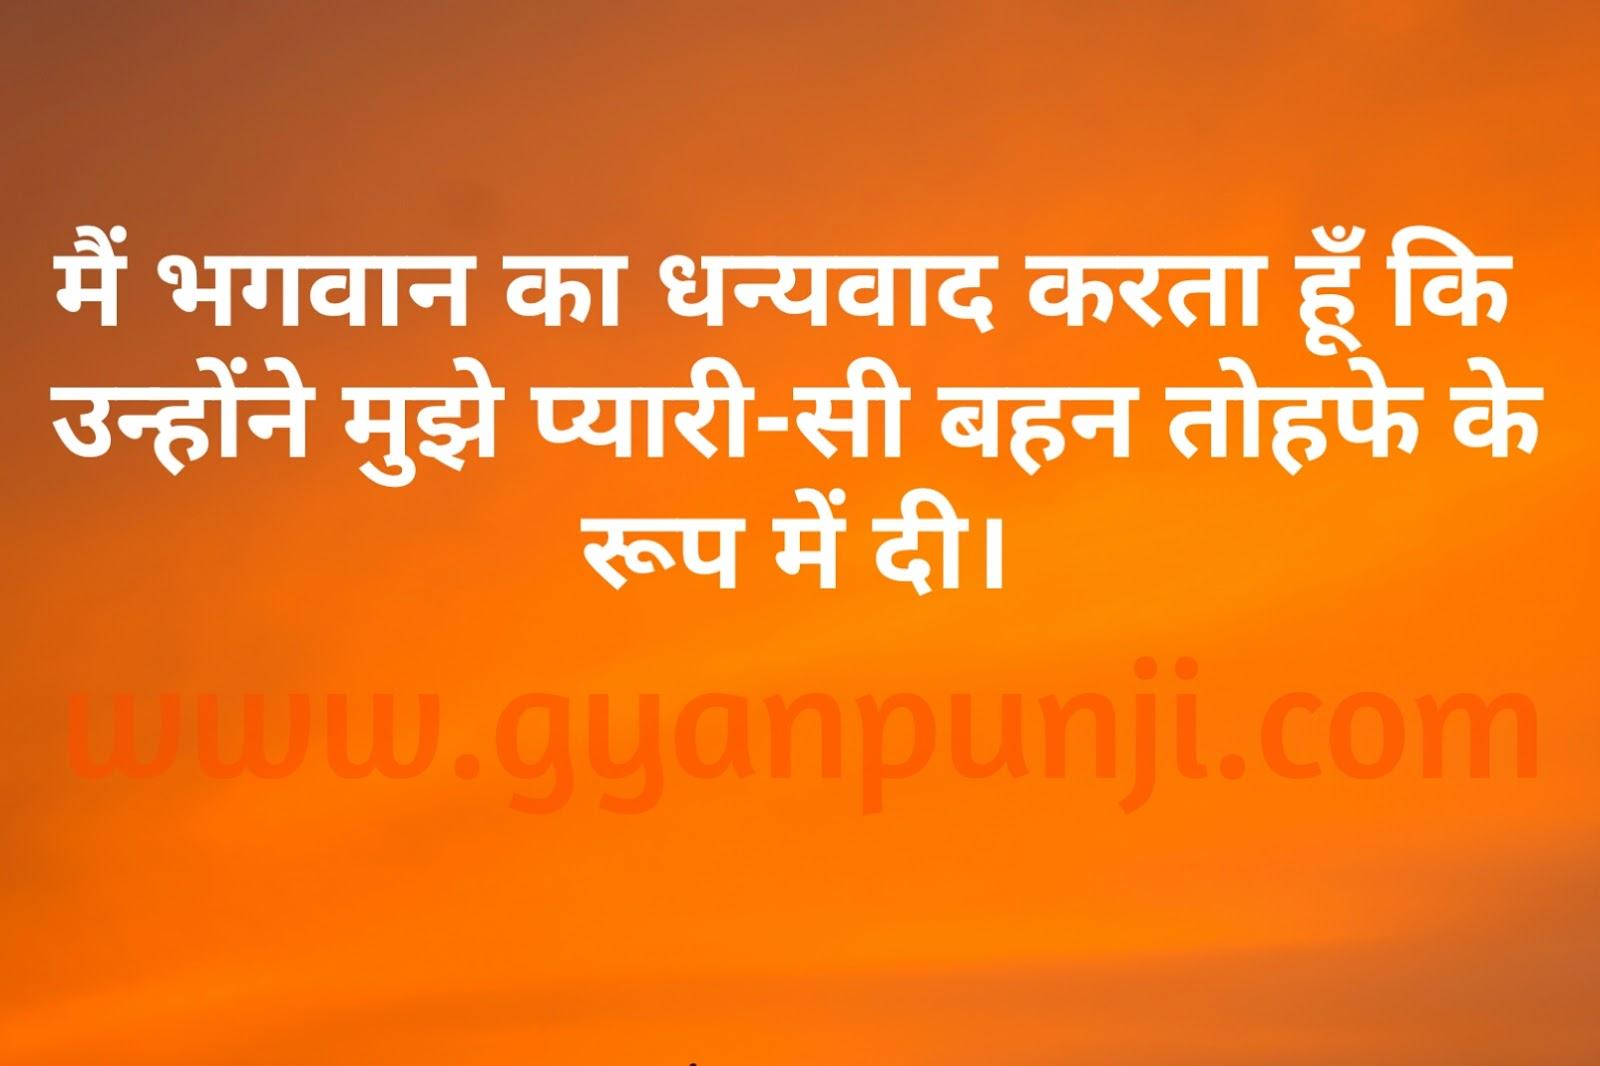 रक्षा बंधन पर विचार (Raksha Bandhan Quotes In Hindi